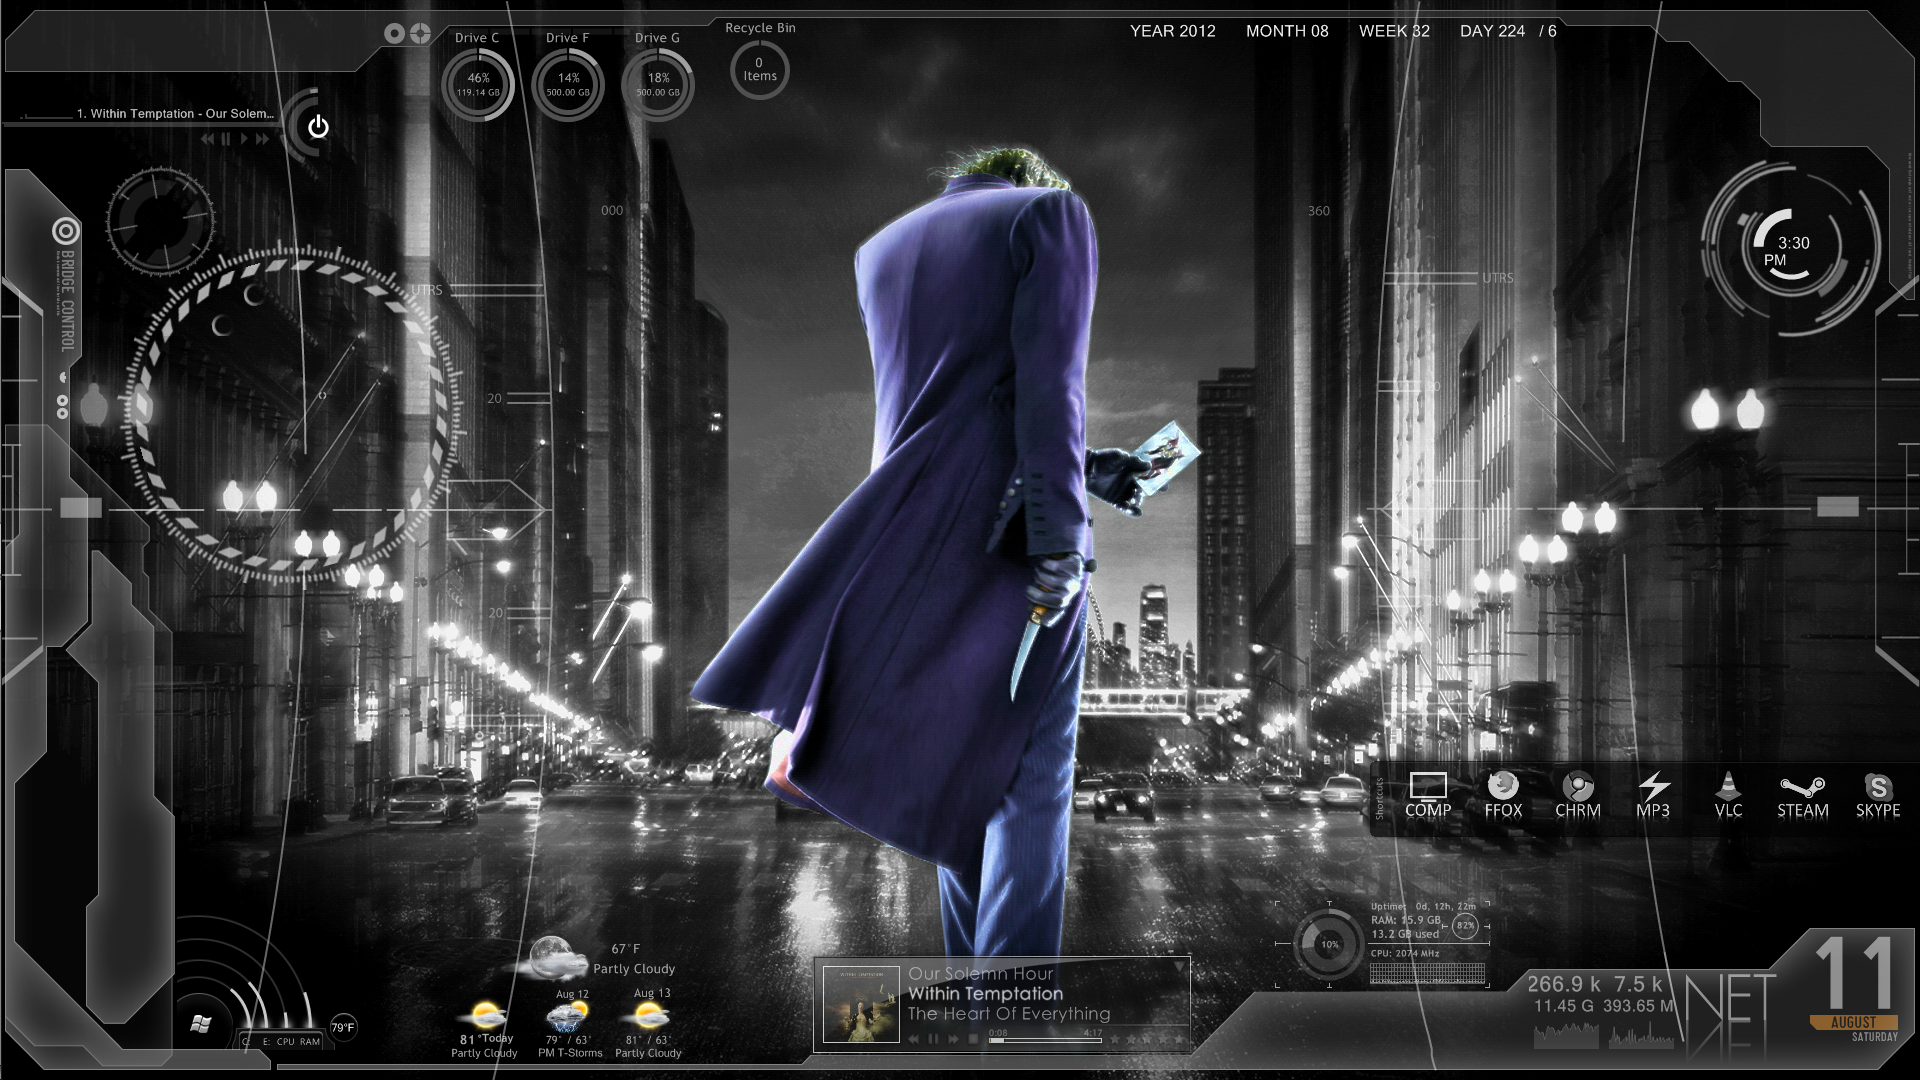 skins themes windows utilities windows 7 utilities other 2012 2015 1920x1080